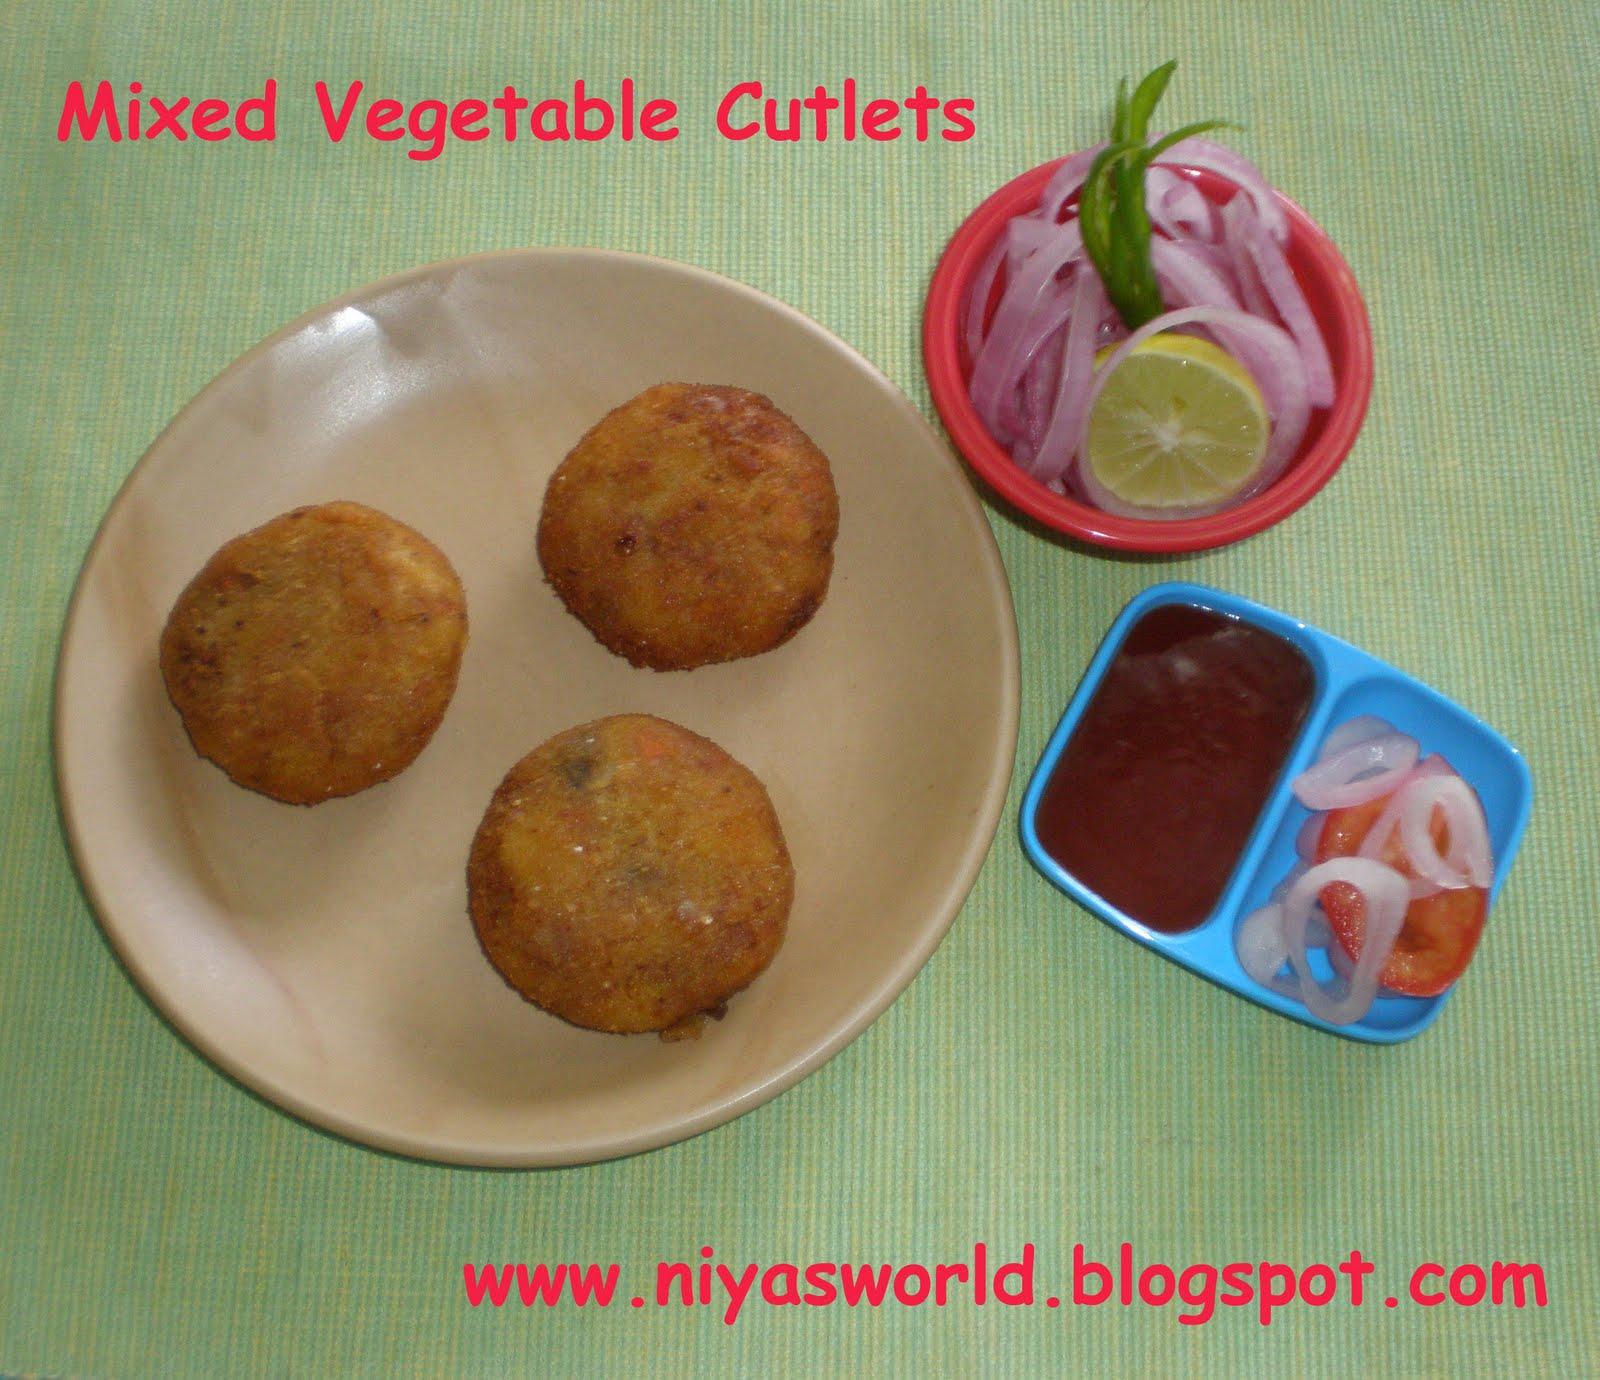 Niya's World: Mixed Vegetable Cutlets